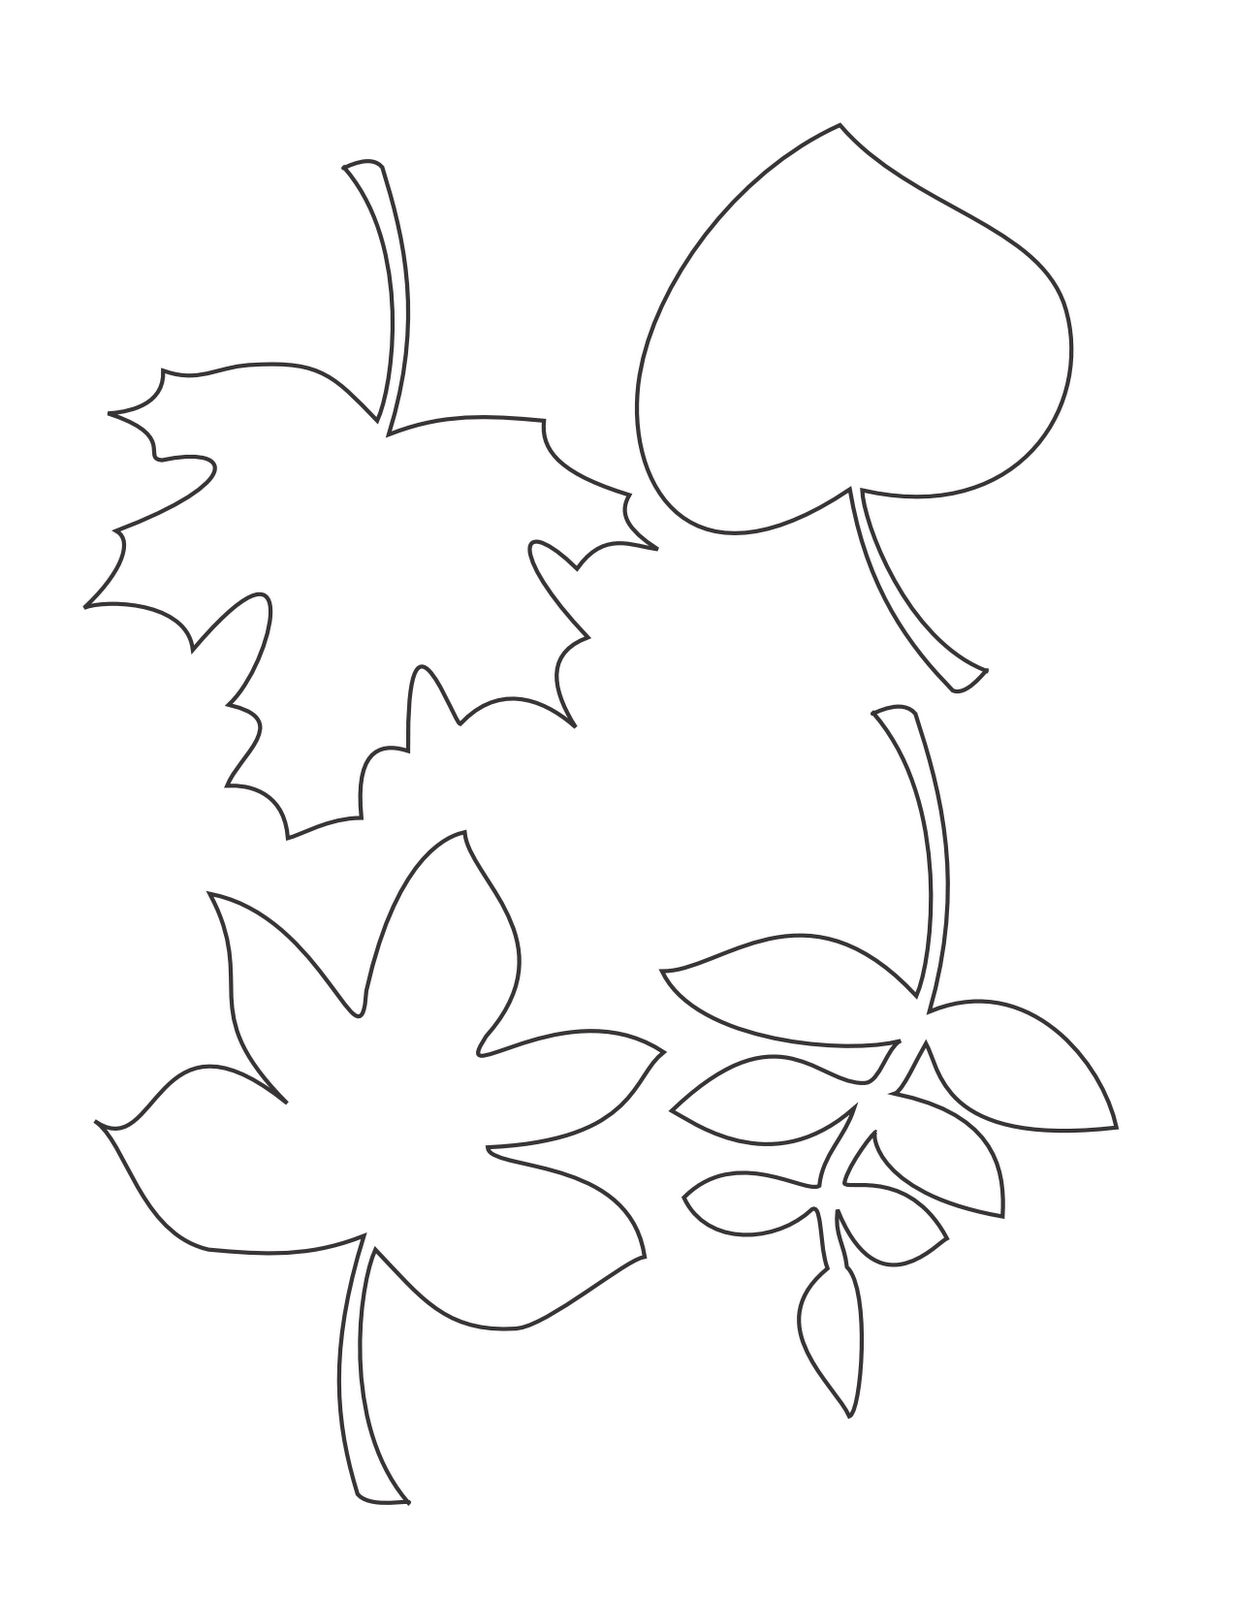 8 Images of Free Printable Leaf Patterns Designs